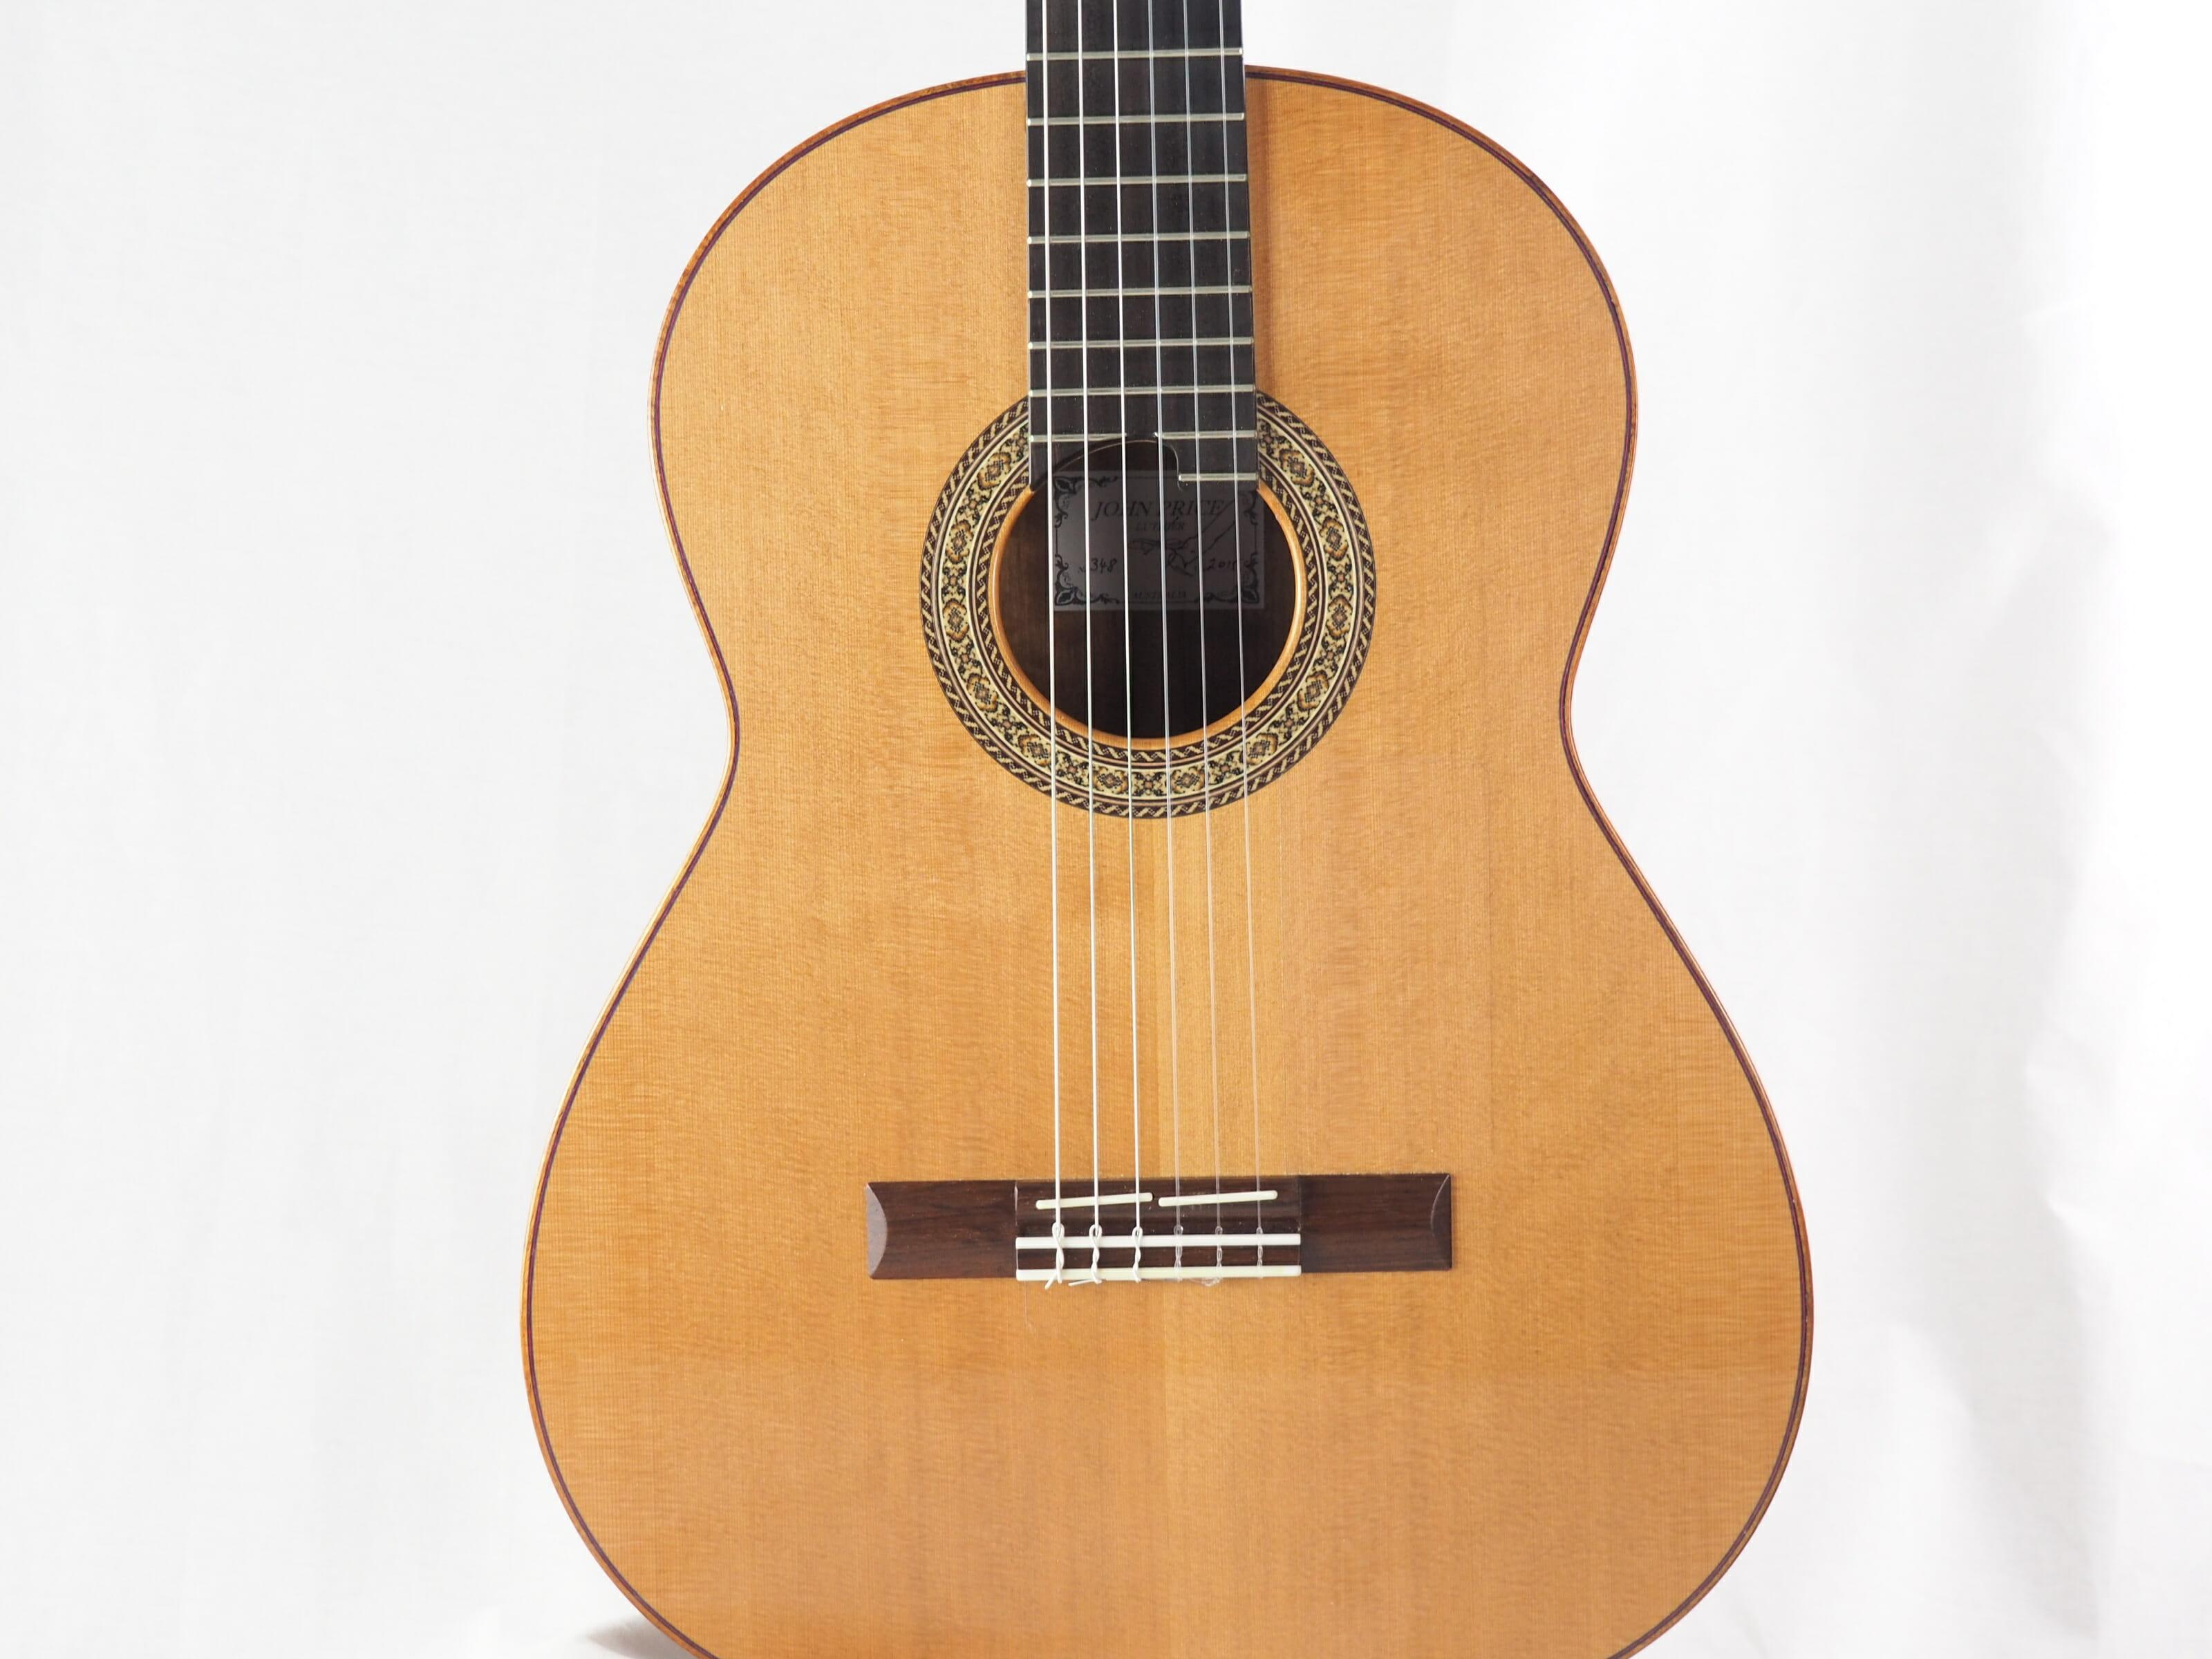 John Price luthier guitare classique No 19PRI348-02